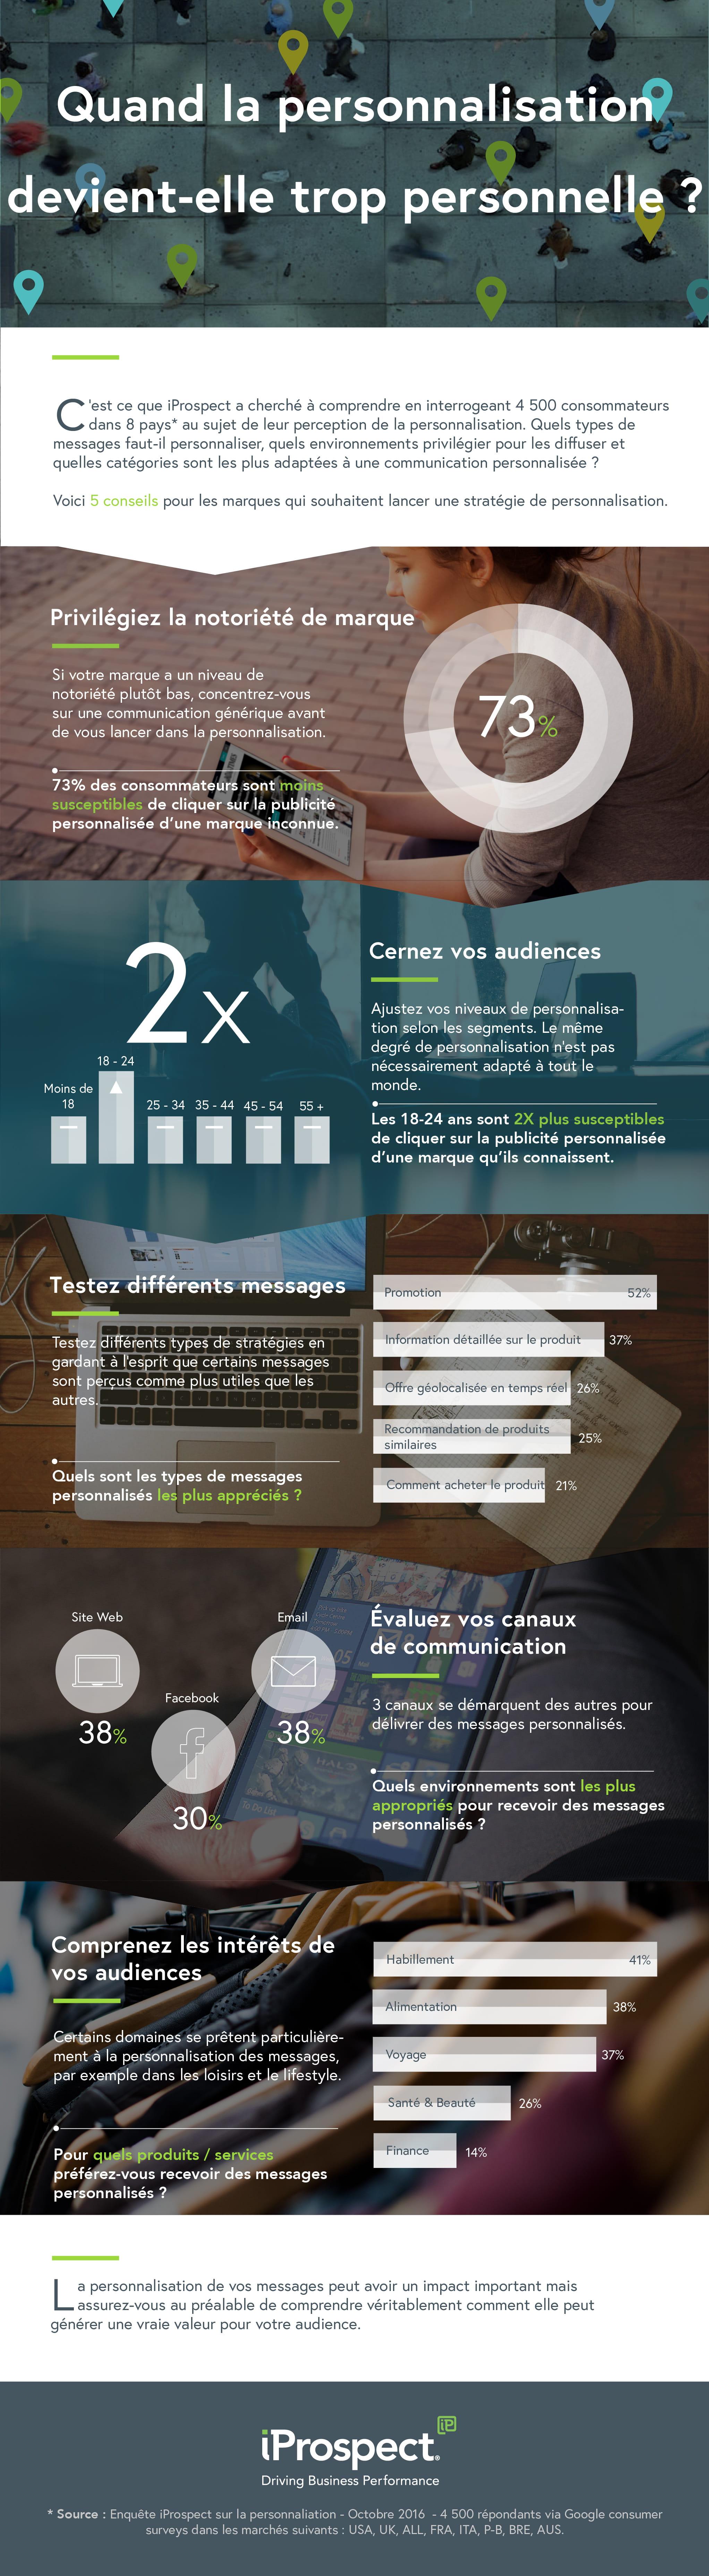 Infographie personnalisation marketing